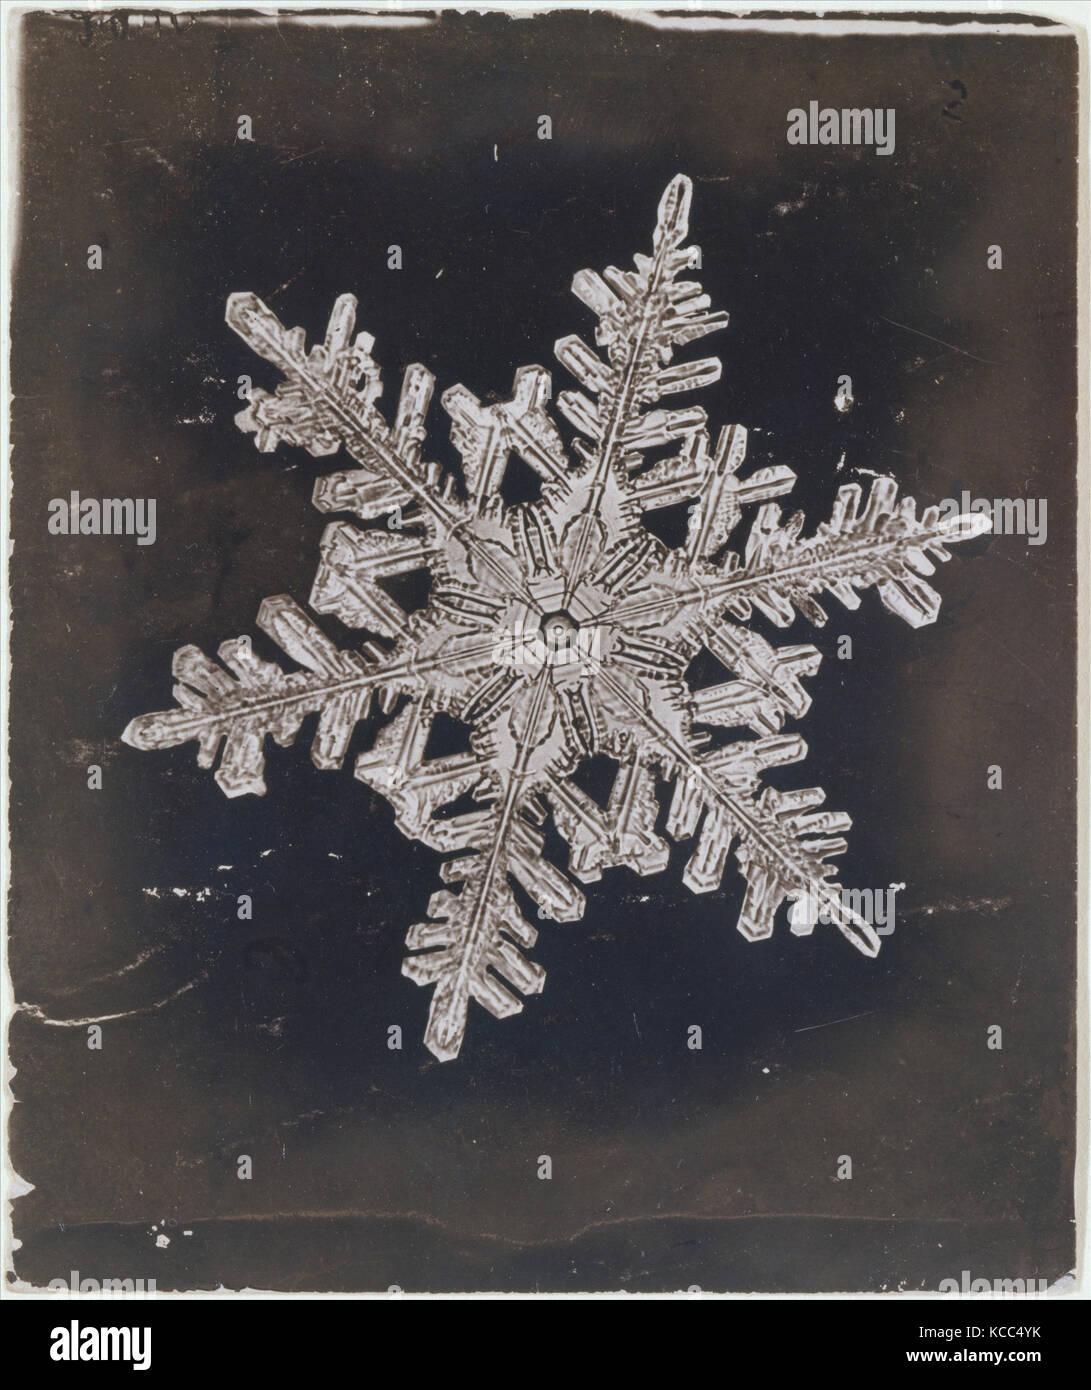 Snow Crystal, ca. 1910, Gelatin silver print, Image: 7.4 x 9 cm (2 15/16 x 3 9/16 in.), Photographs, Wilson Alwyn - Stock Image